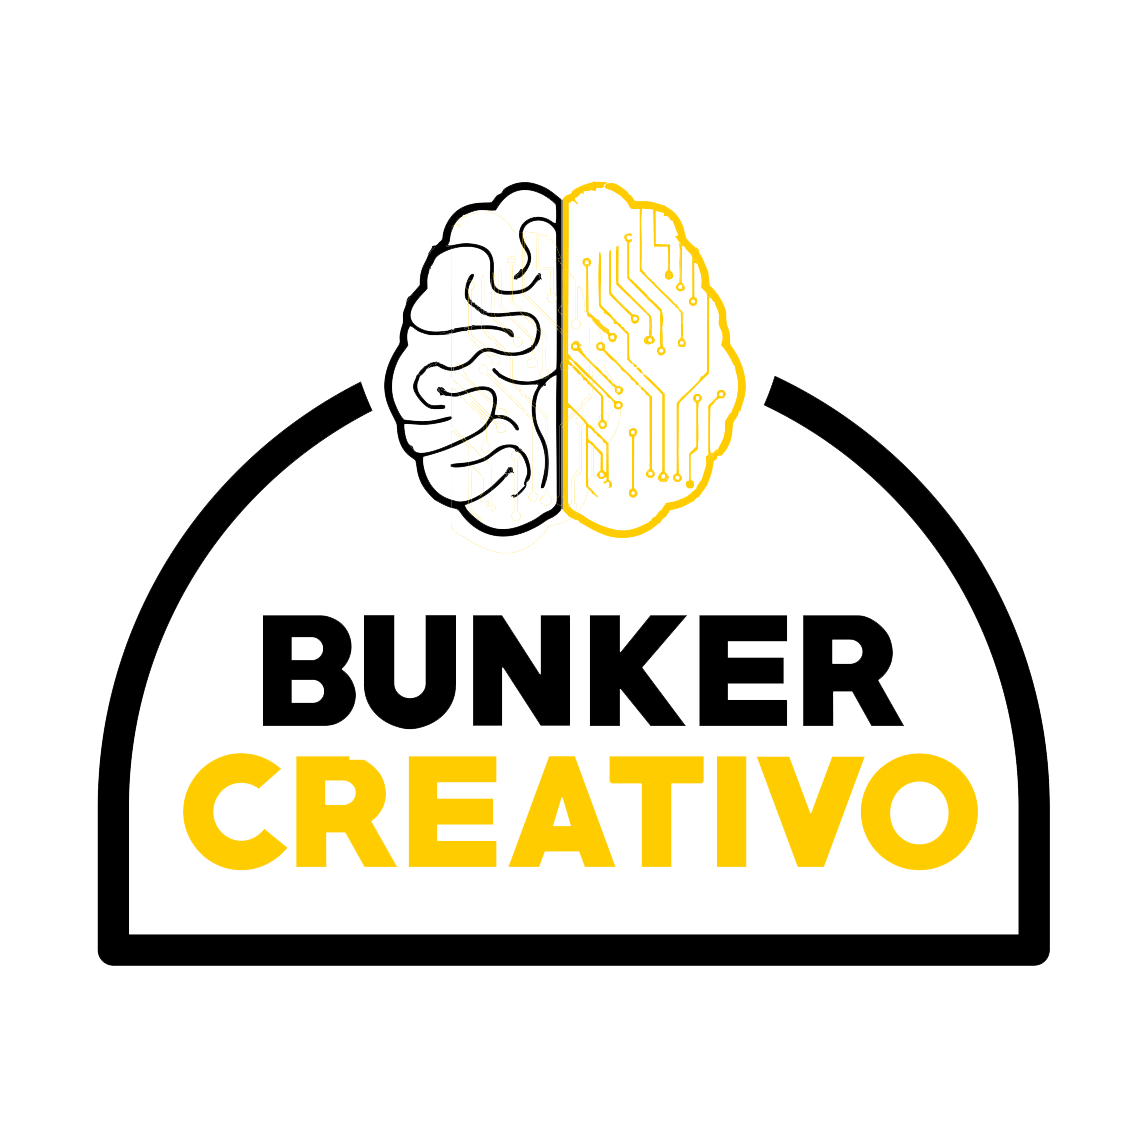 bunker creativo